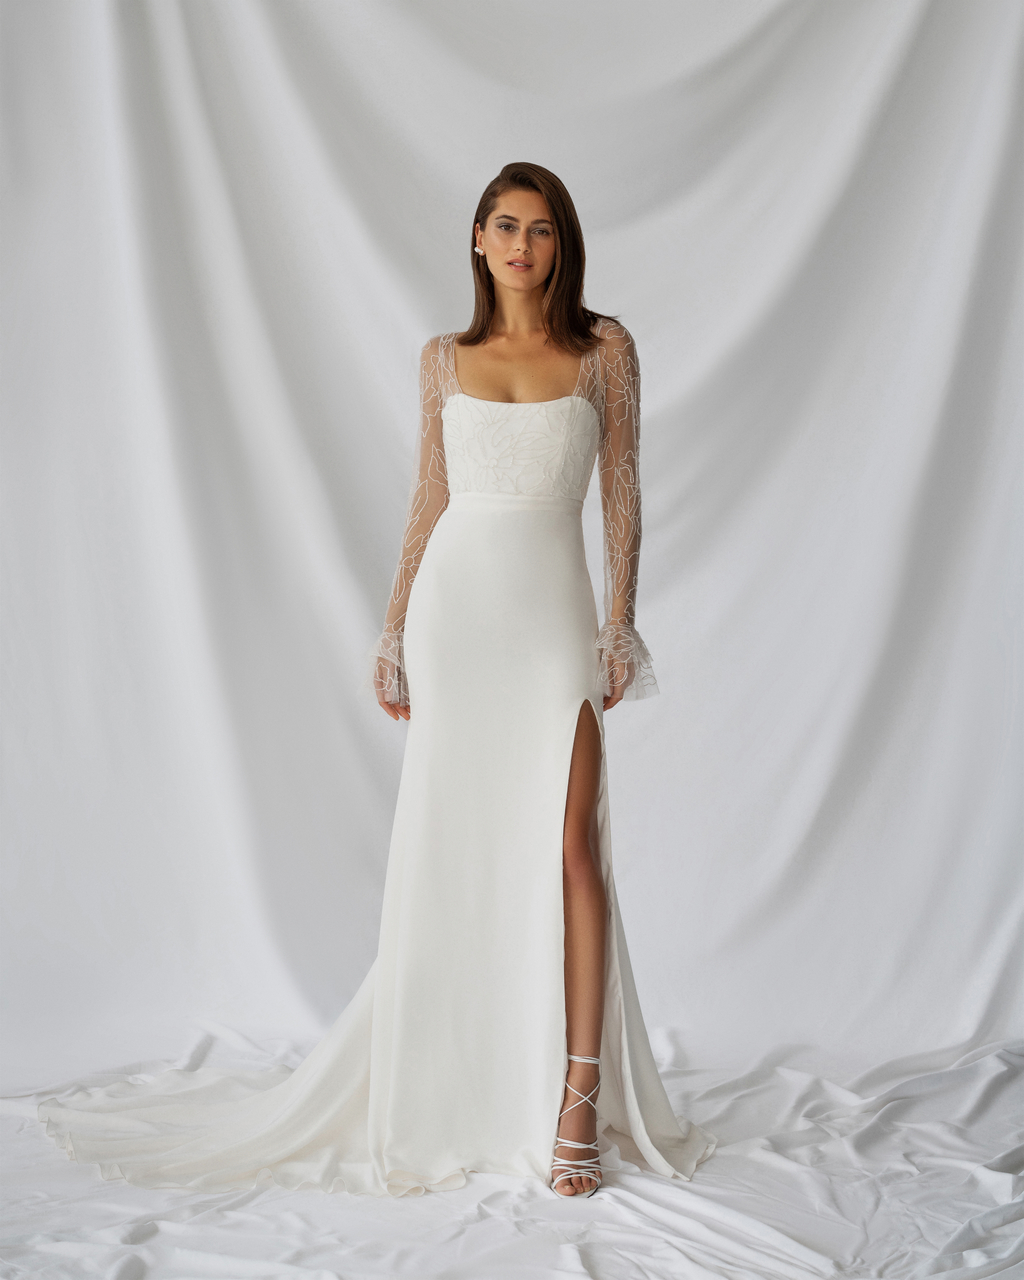 bryn dress photo